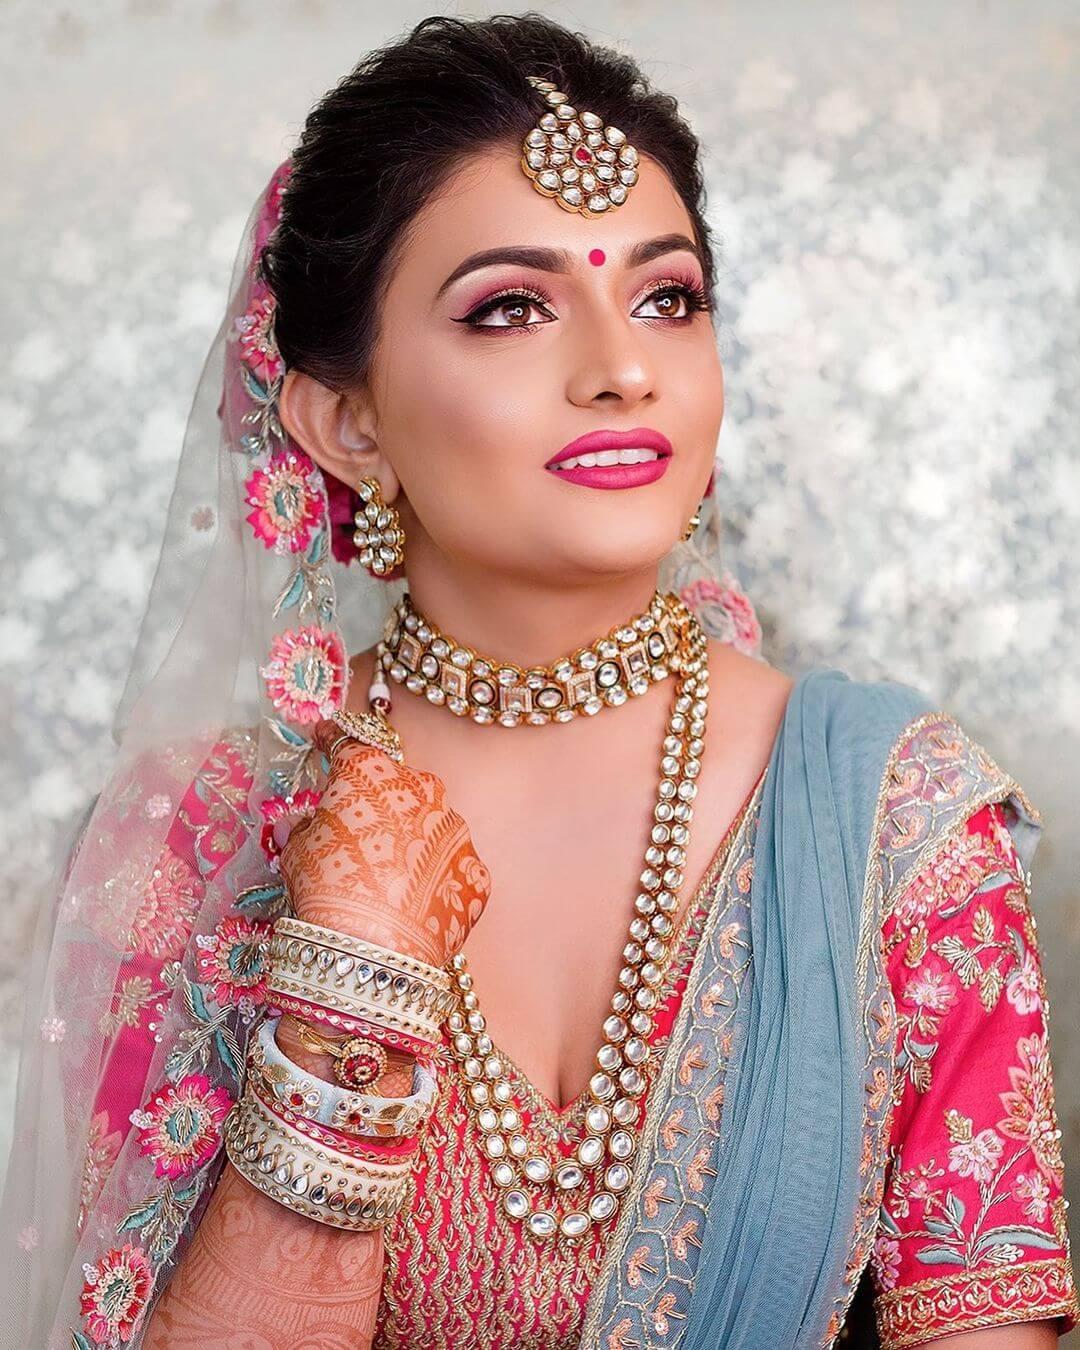 Pretty In Pink bridal Look - traditional Gujarati bridal makeup looks